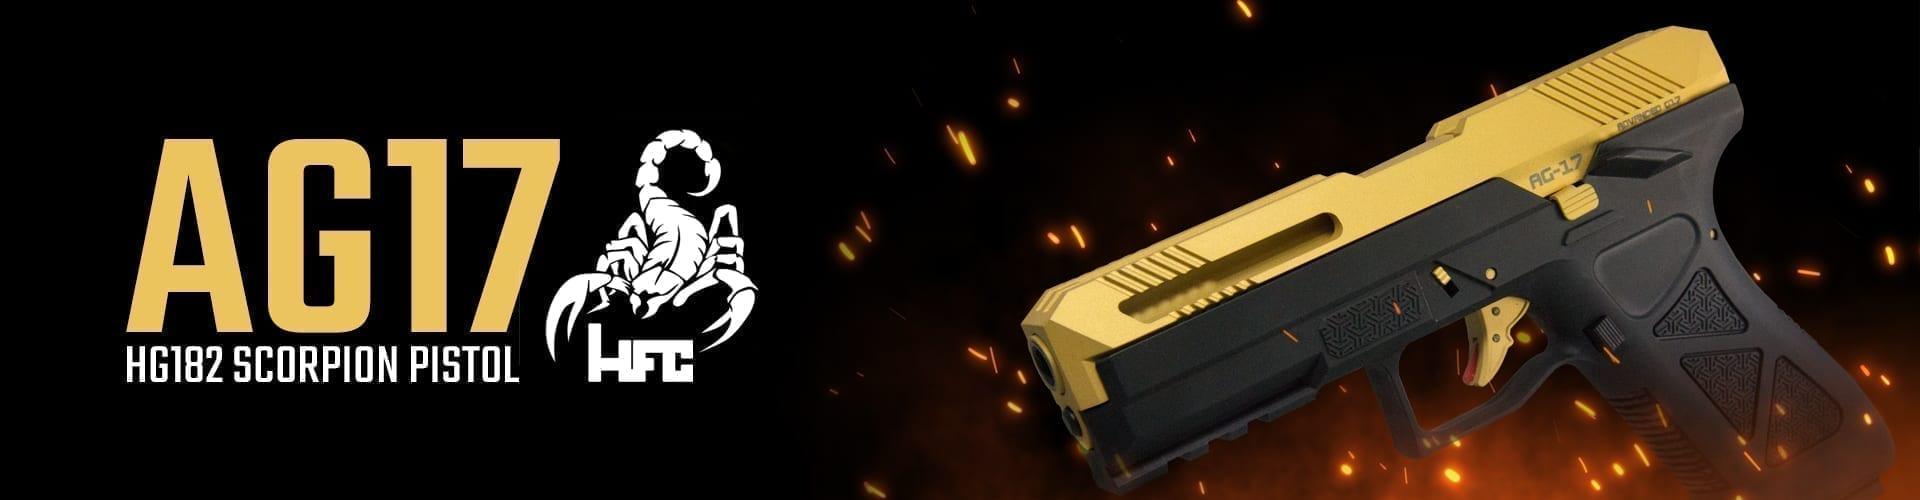 HG182 AG17 Scorpion Gas Airsoft Pistol